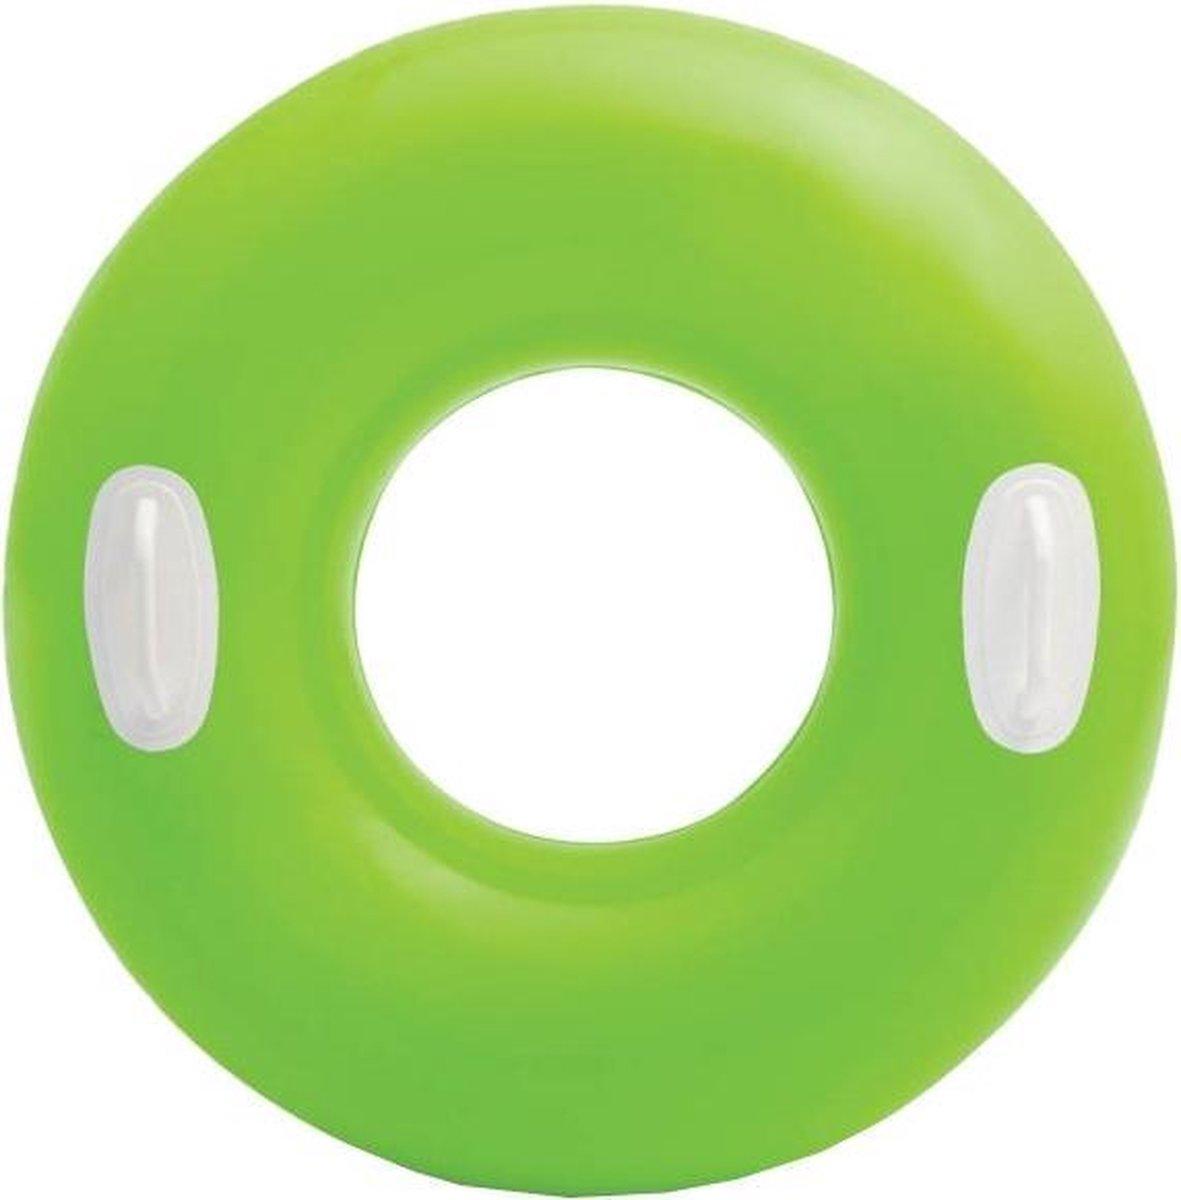 Intex Zwemband Groen 76 Cm